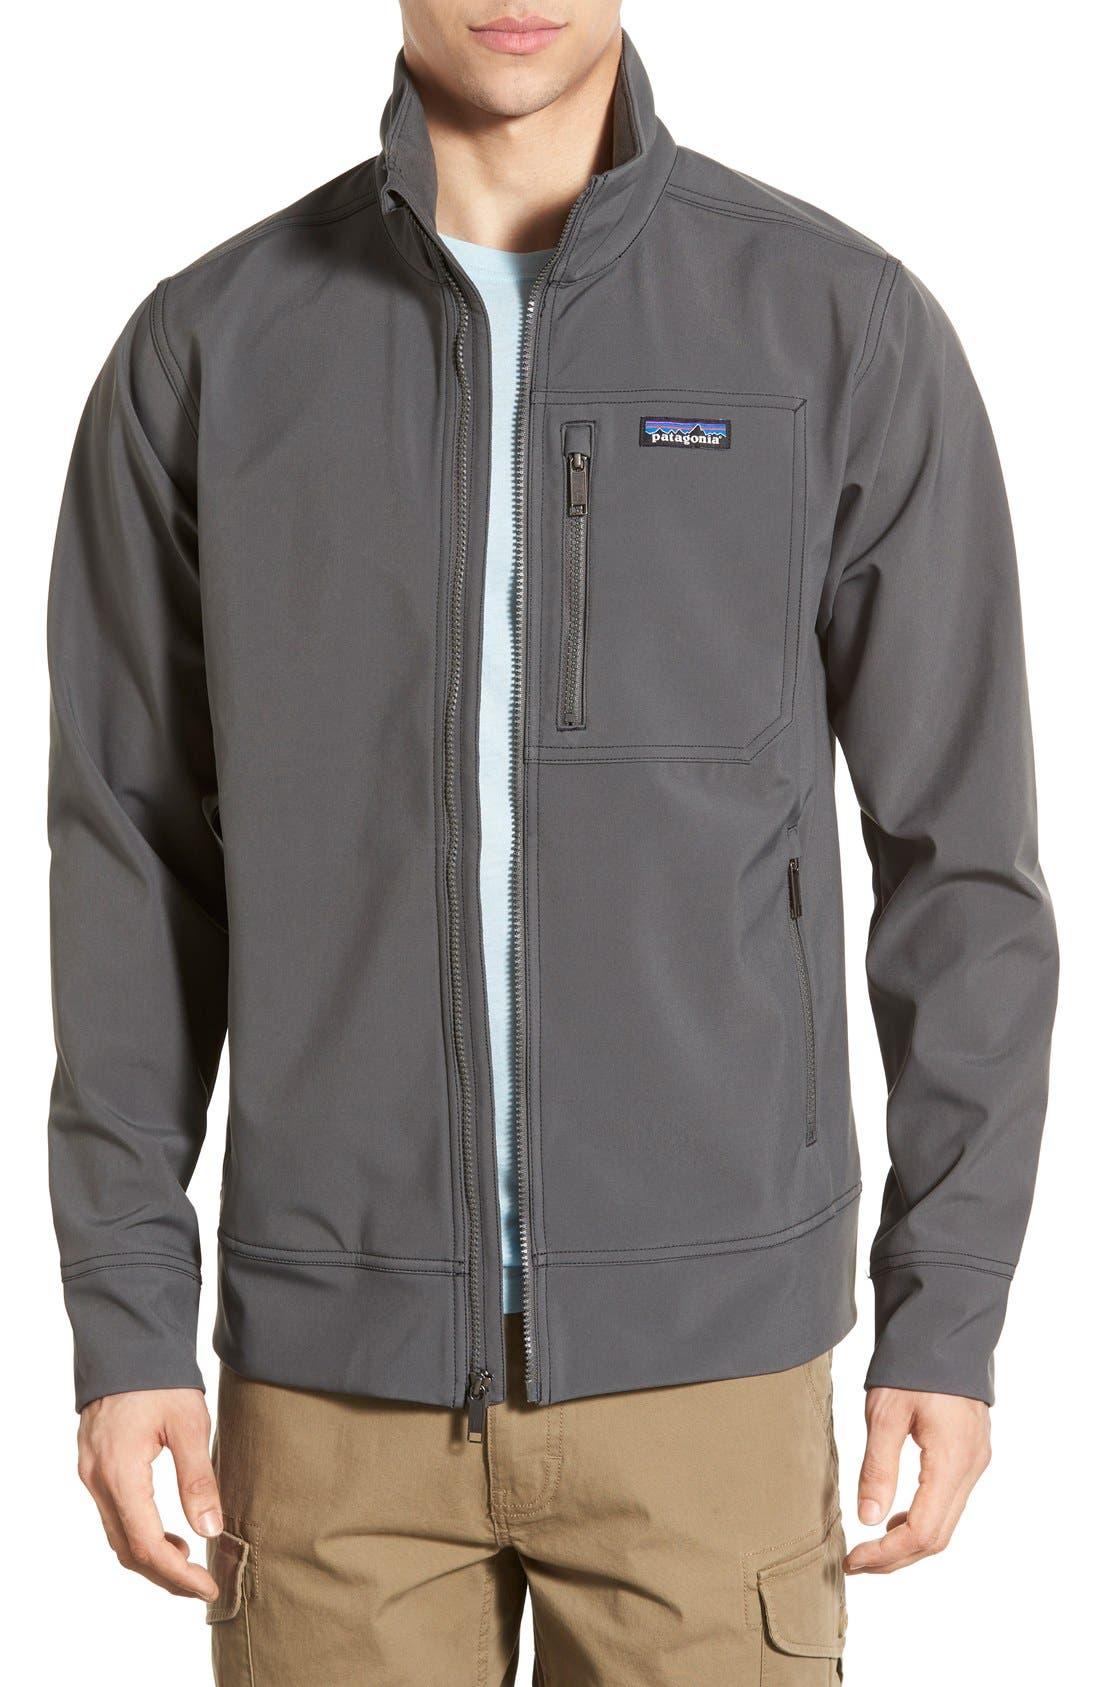 Main Image - Patagonia 'Sidesend' Regular Fit Water Repellent Jacket